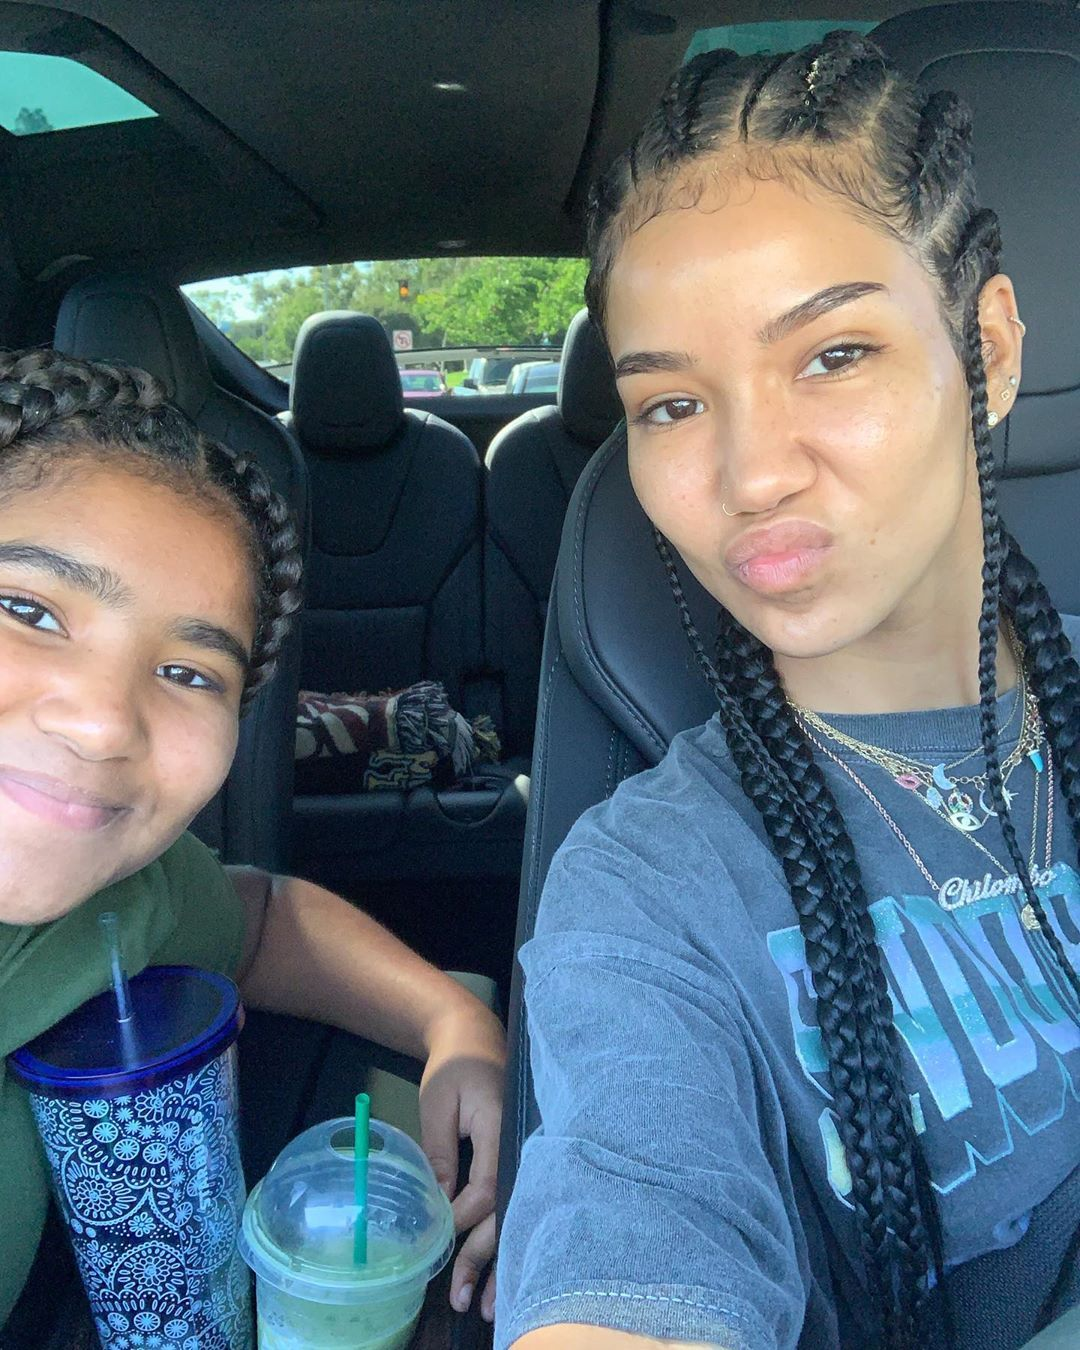 Chilombo On Instagram Nami Started 6th Grade Today Praise God For My Little Scorpio Soulmate Em 2020 Penteados Com Tranca Penteado Cabelo Curto Cabelo